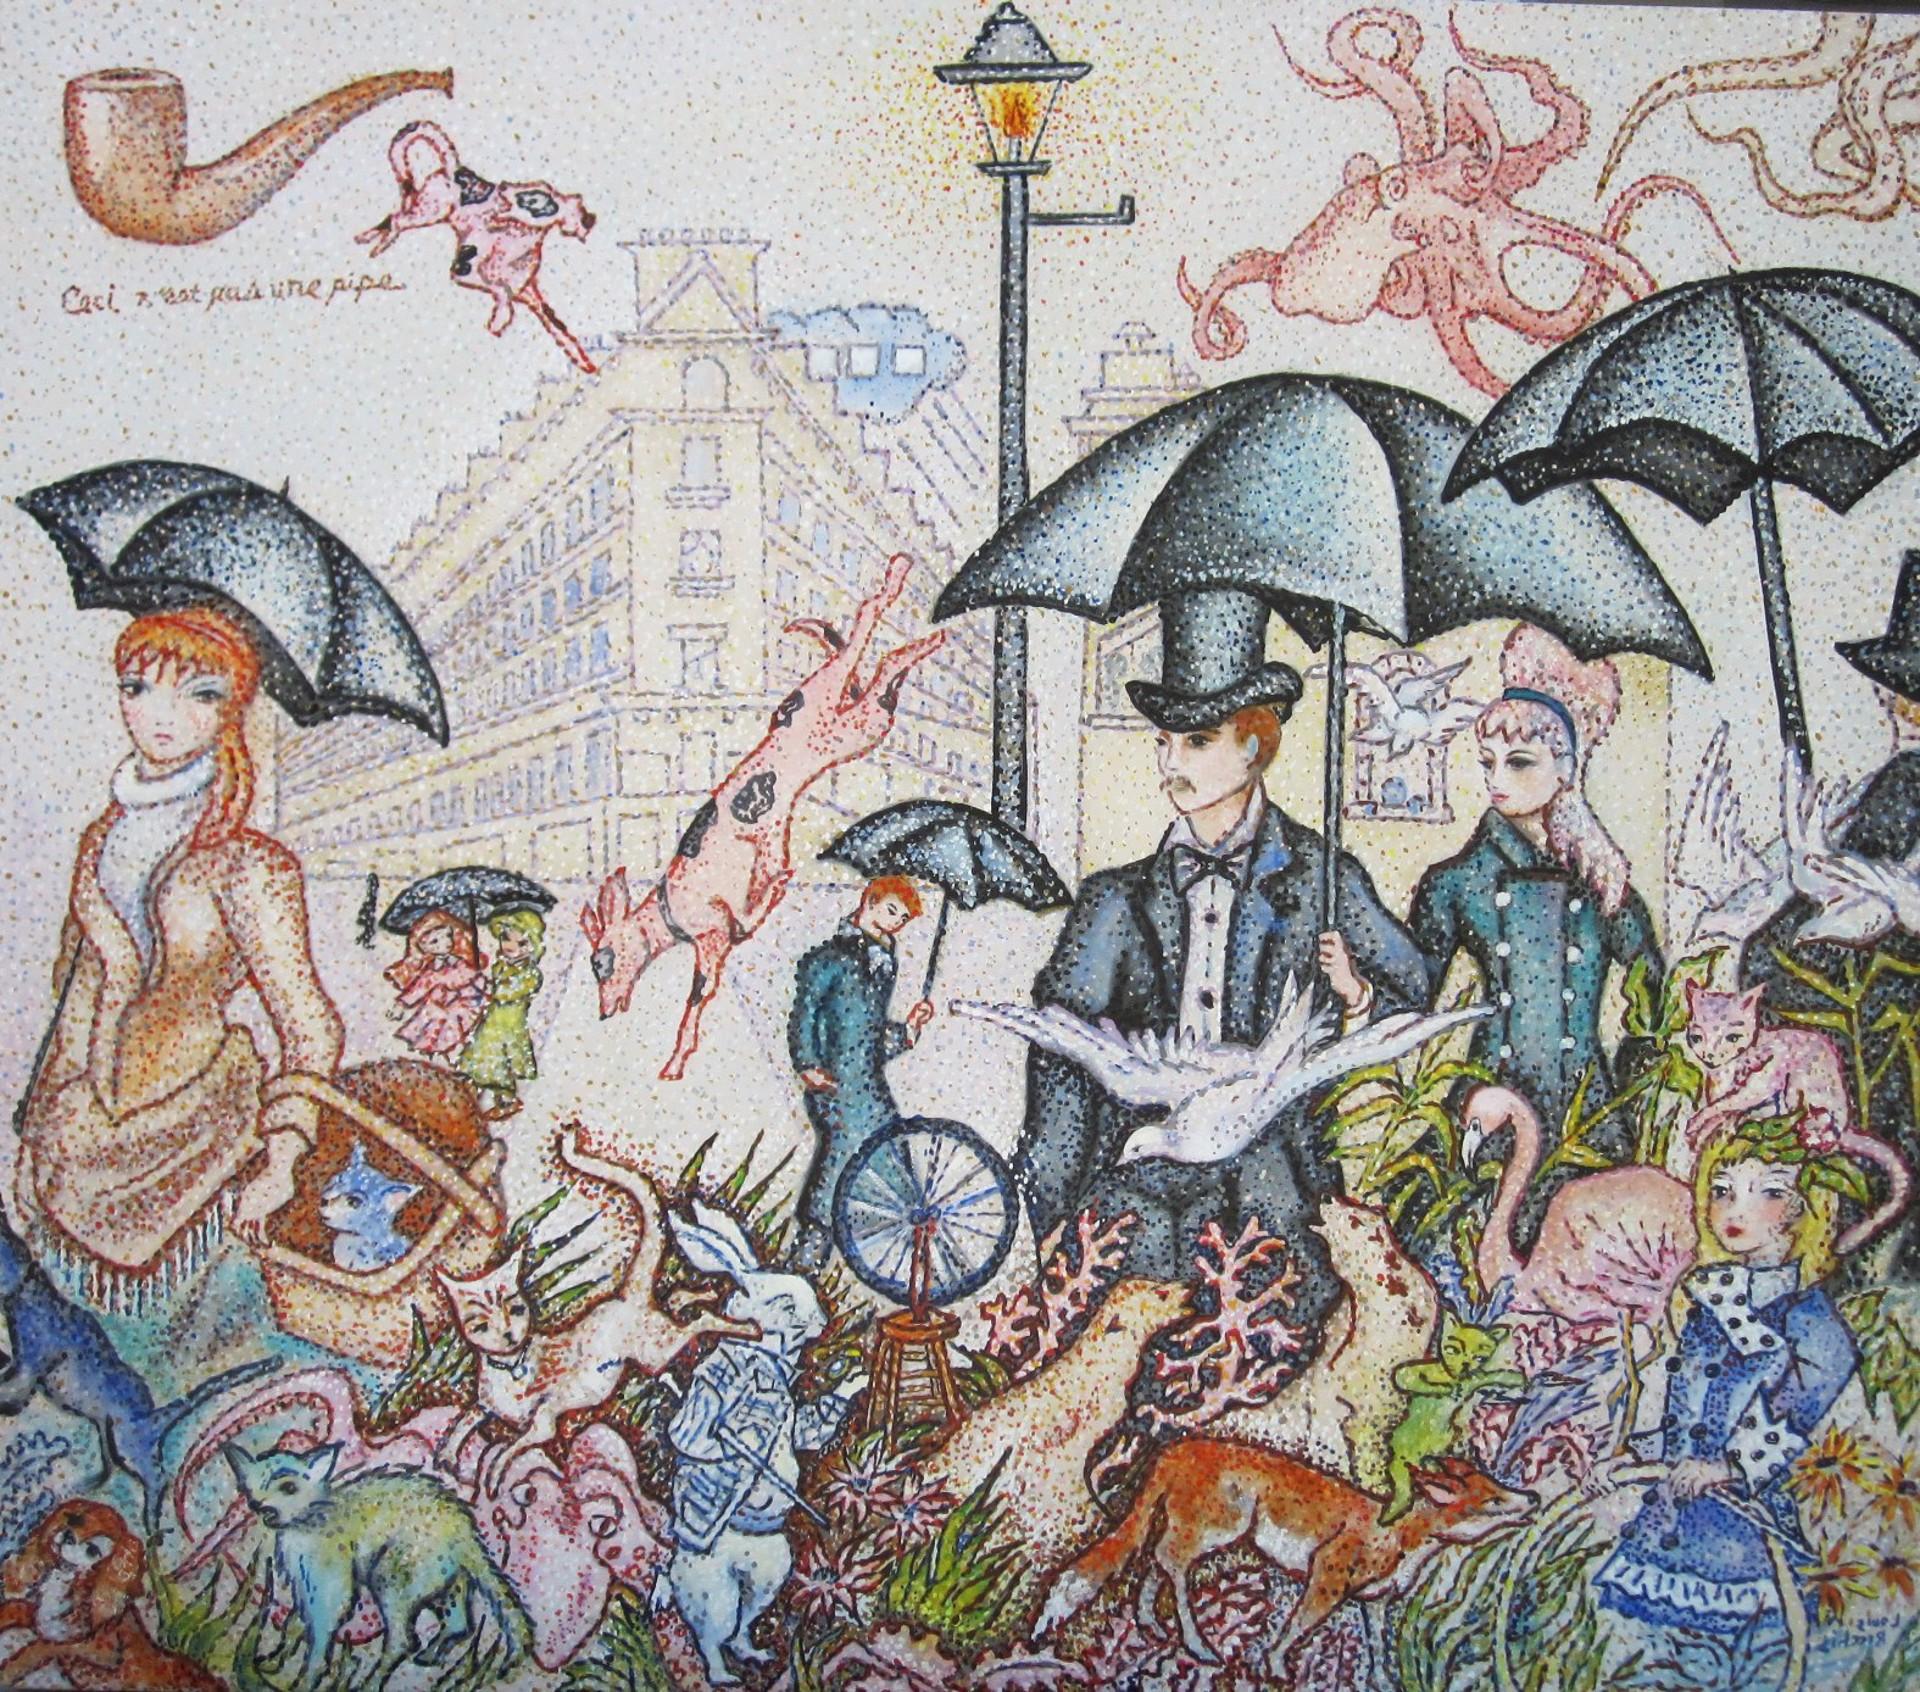 Rainy Day in Paris by Louis Recchia